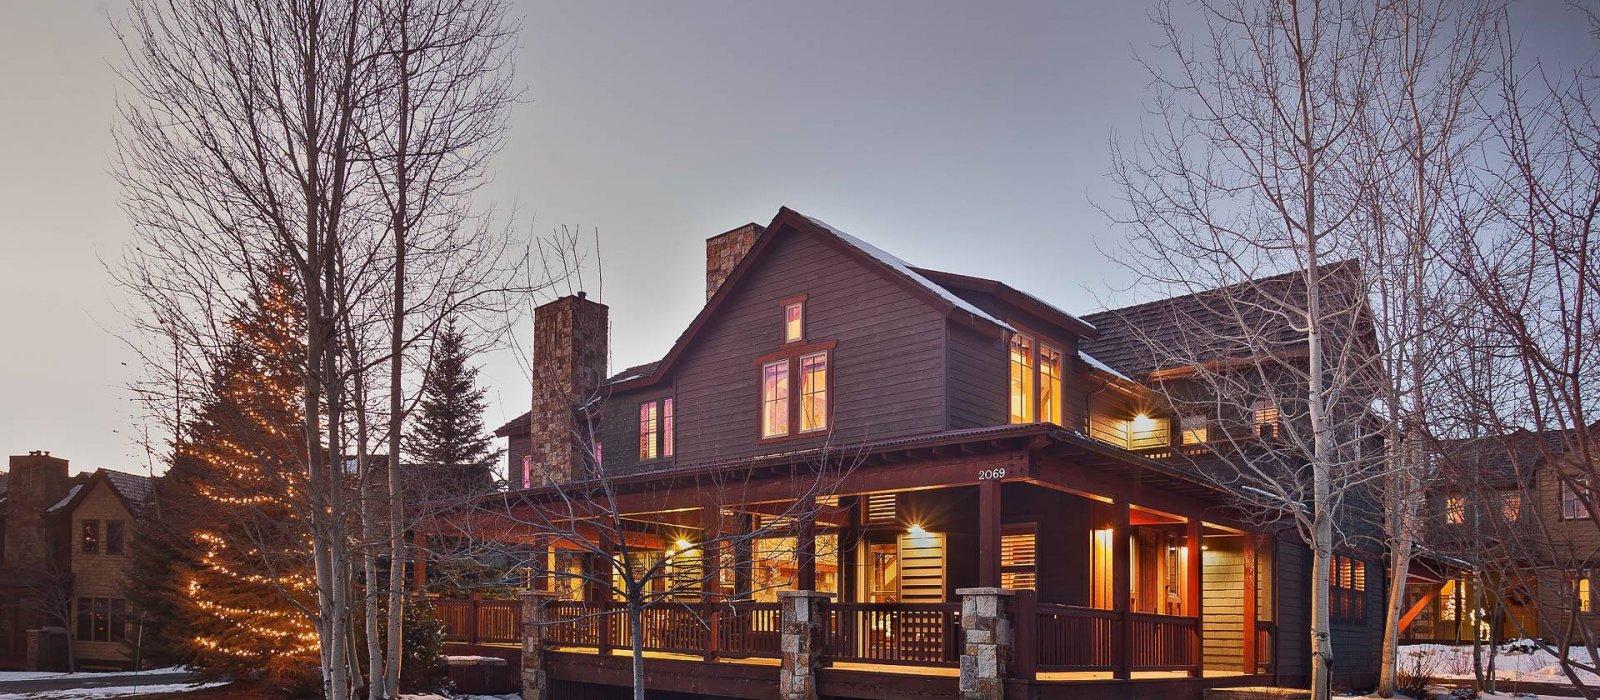 Wondrous Rocking Chair Lodge Steamboat Springs Vacation Villa Machost Co Dining Chair Design Ideas Machostcouk